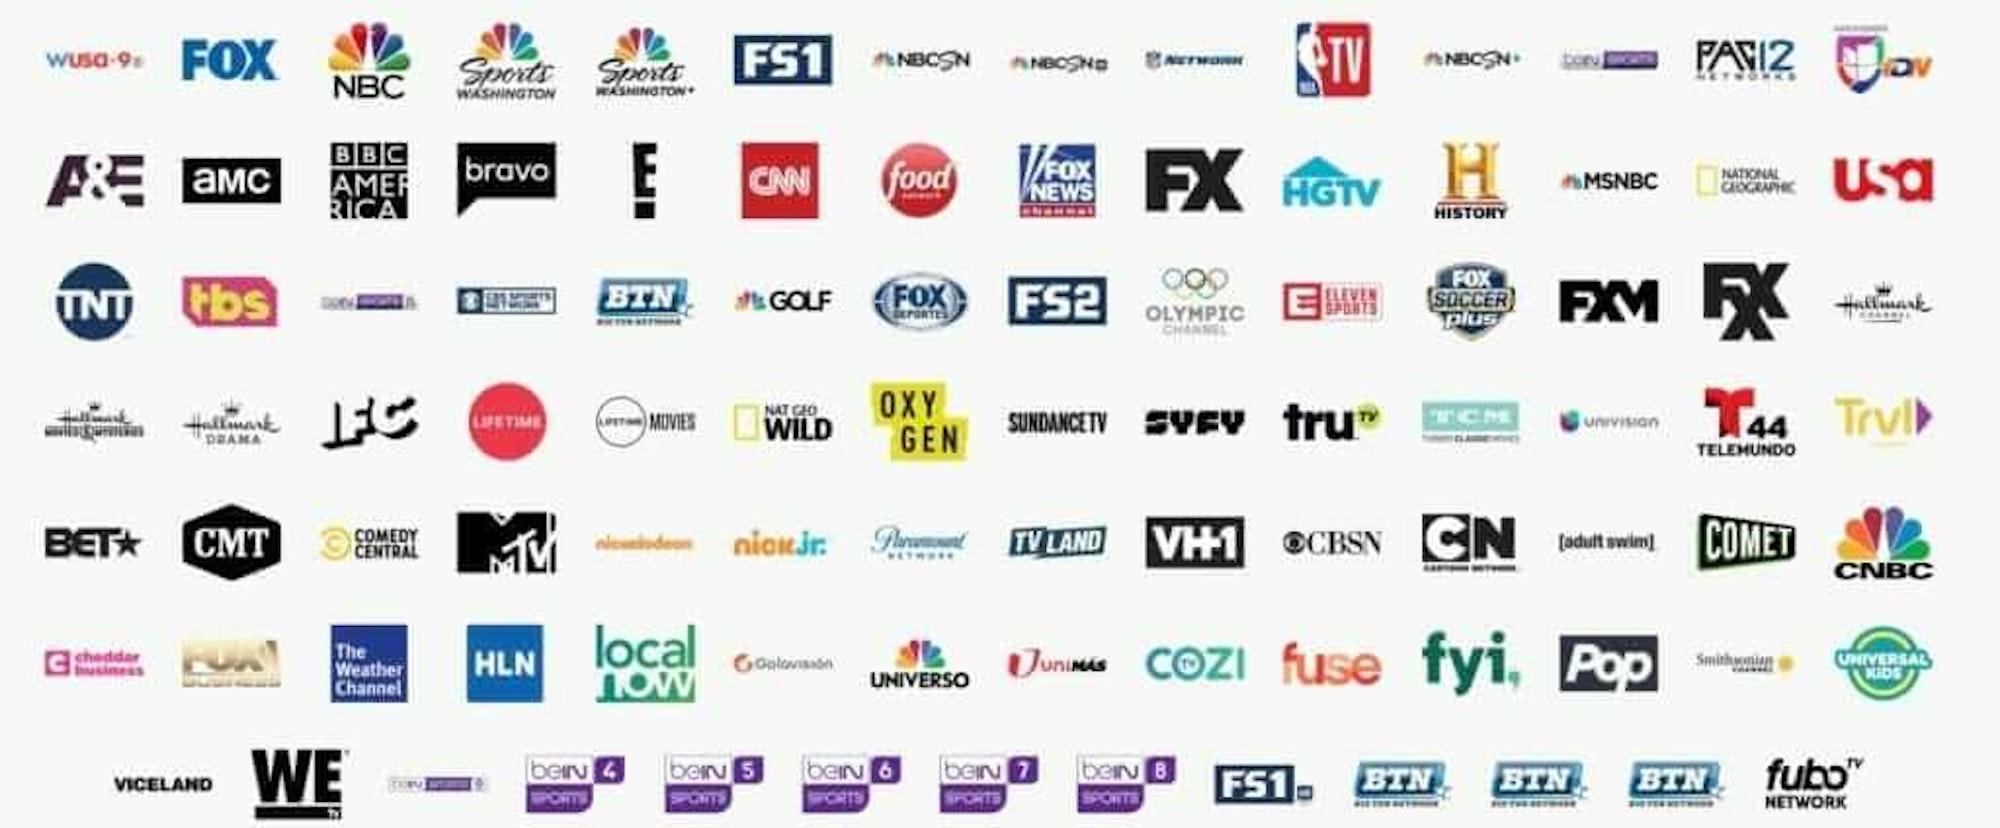 saints seahawks Fubo TV nfl nfc streaming